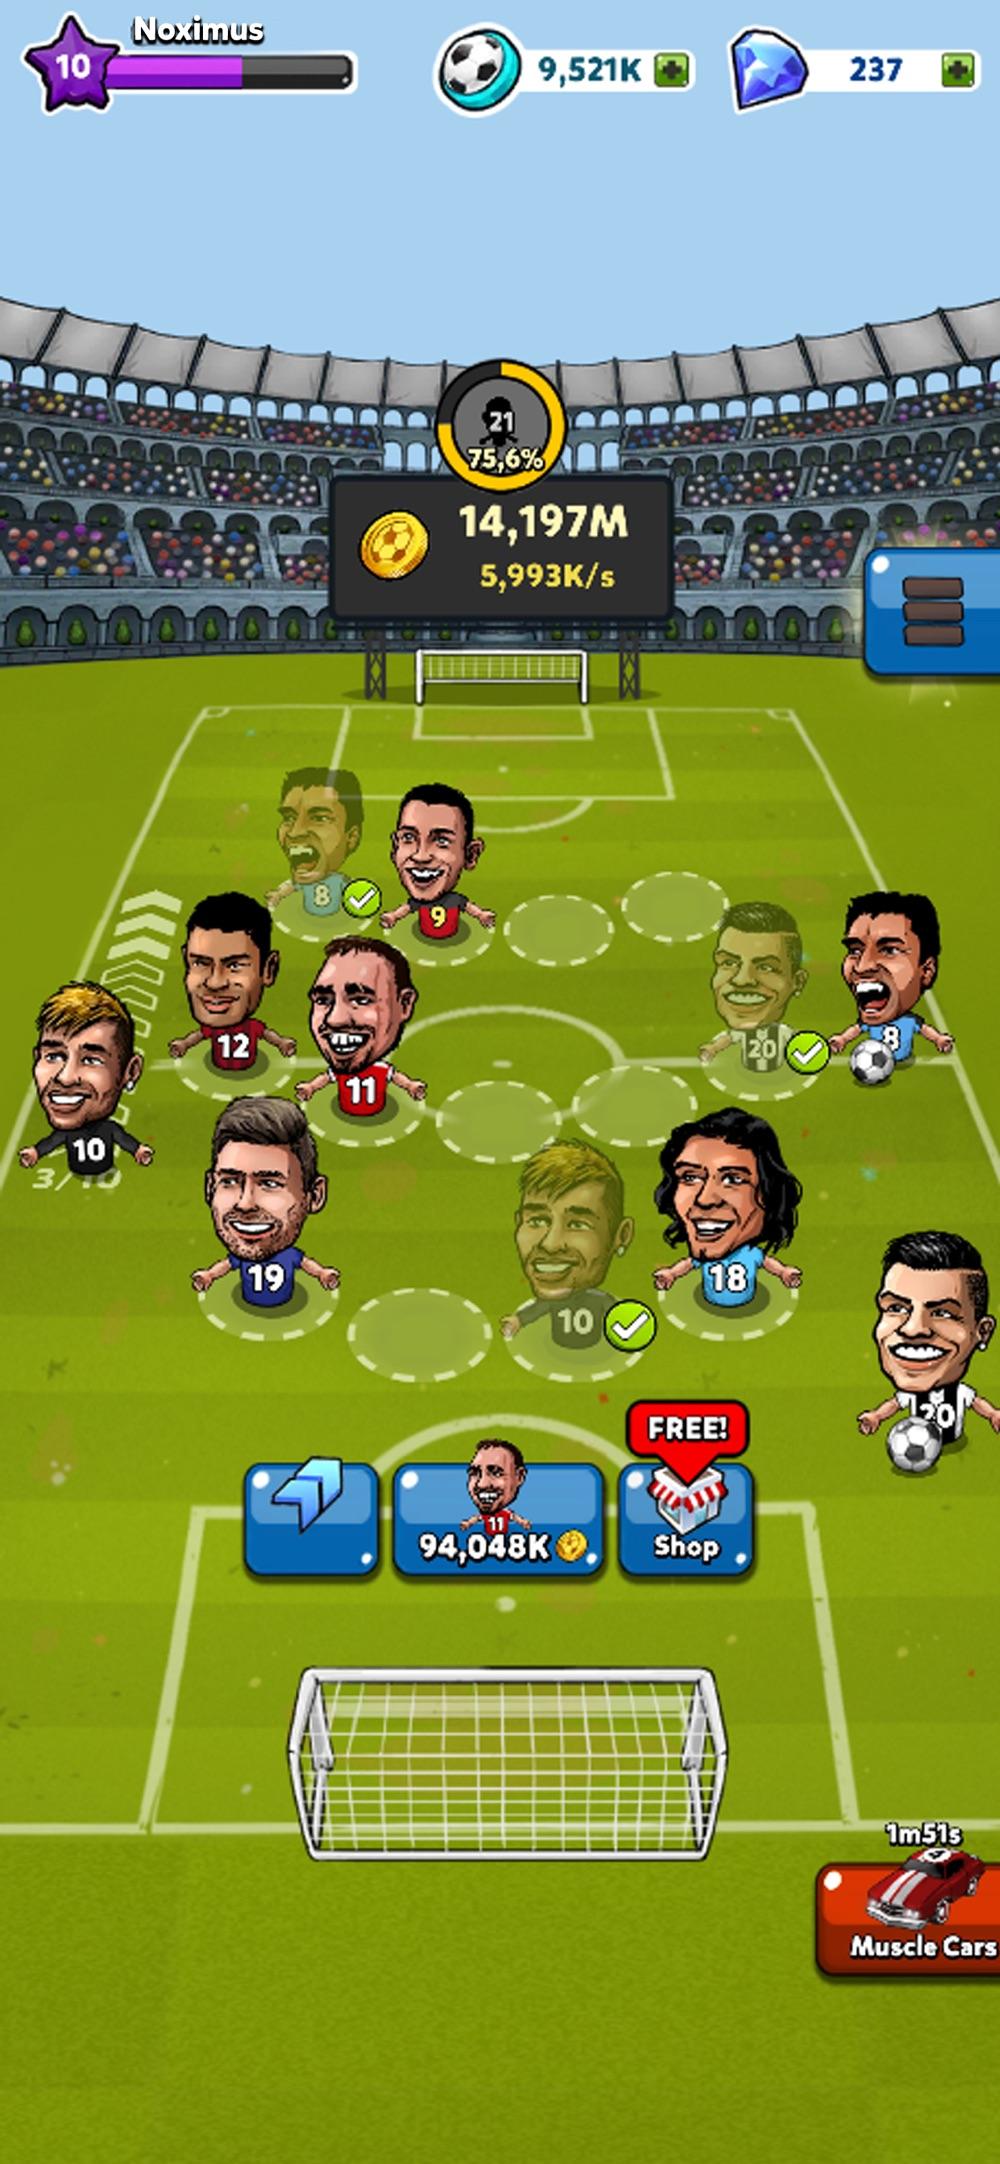 Merge Puppet Soccer hack tool